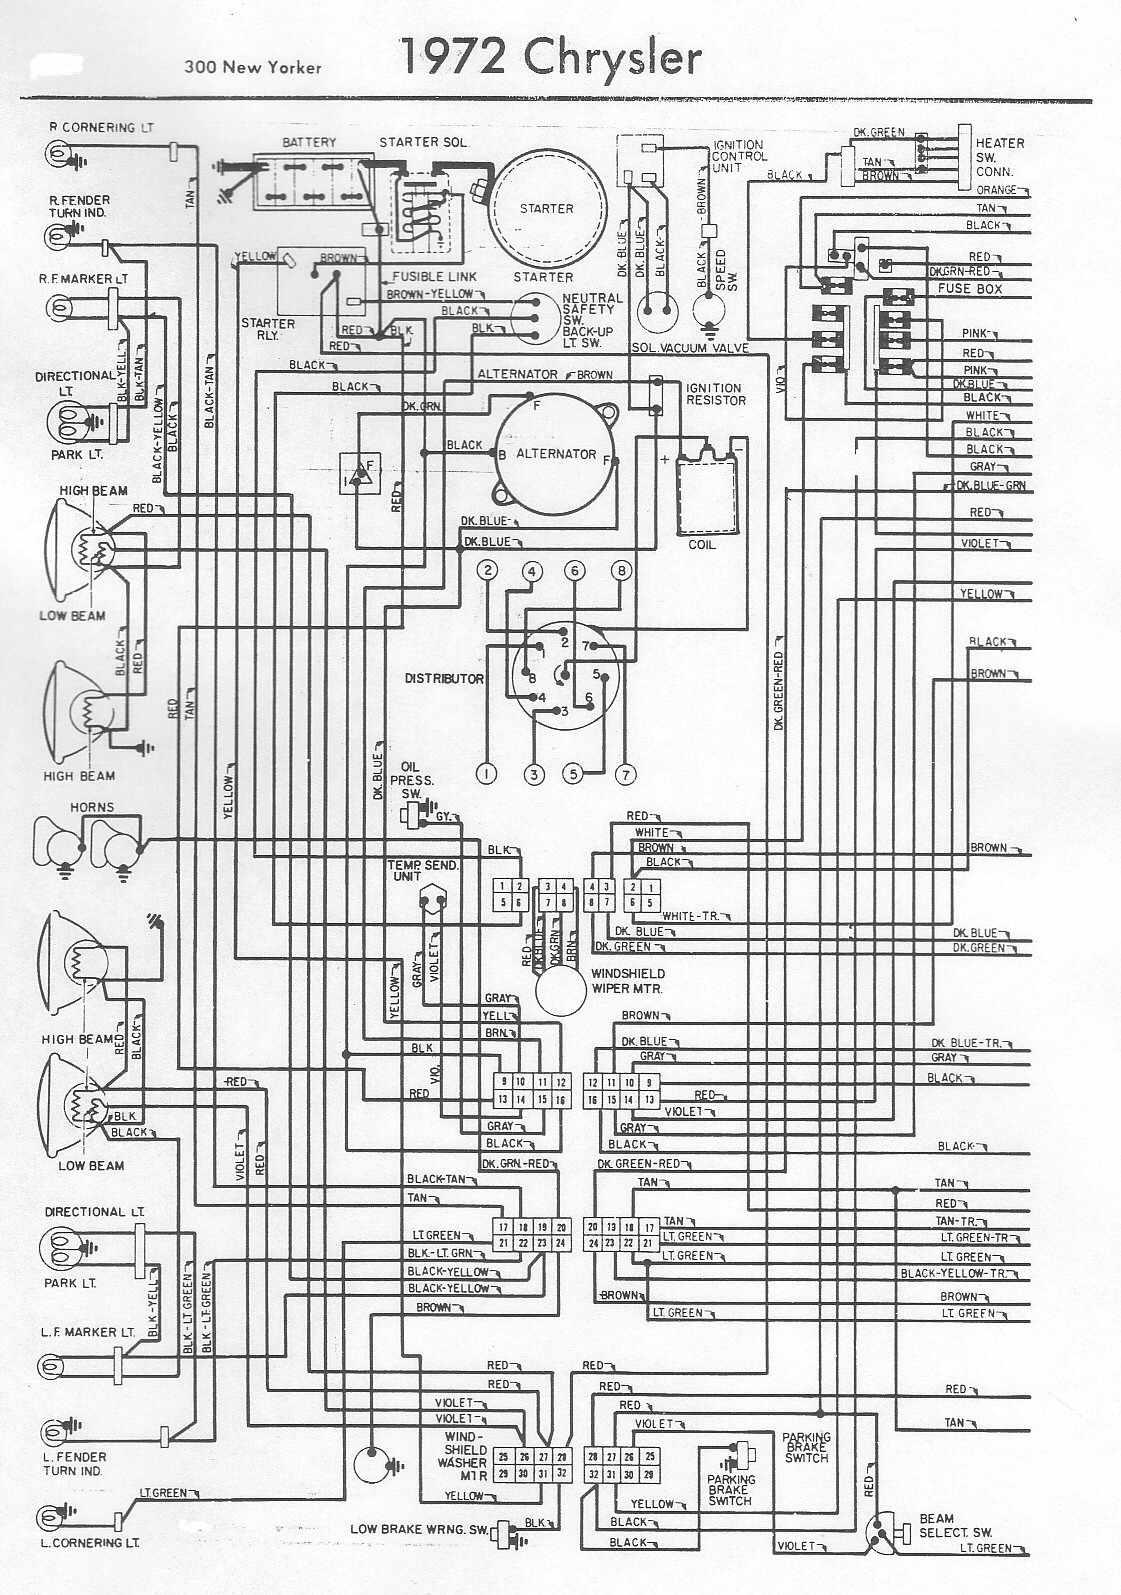 medium resolution of 1985 chrysler new yorker wiring diagram best secret wiring diagram u2022 1985 chrysler 5th avenue 1985 chrysler lebaron wiring diagram